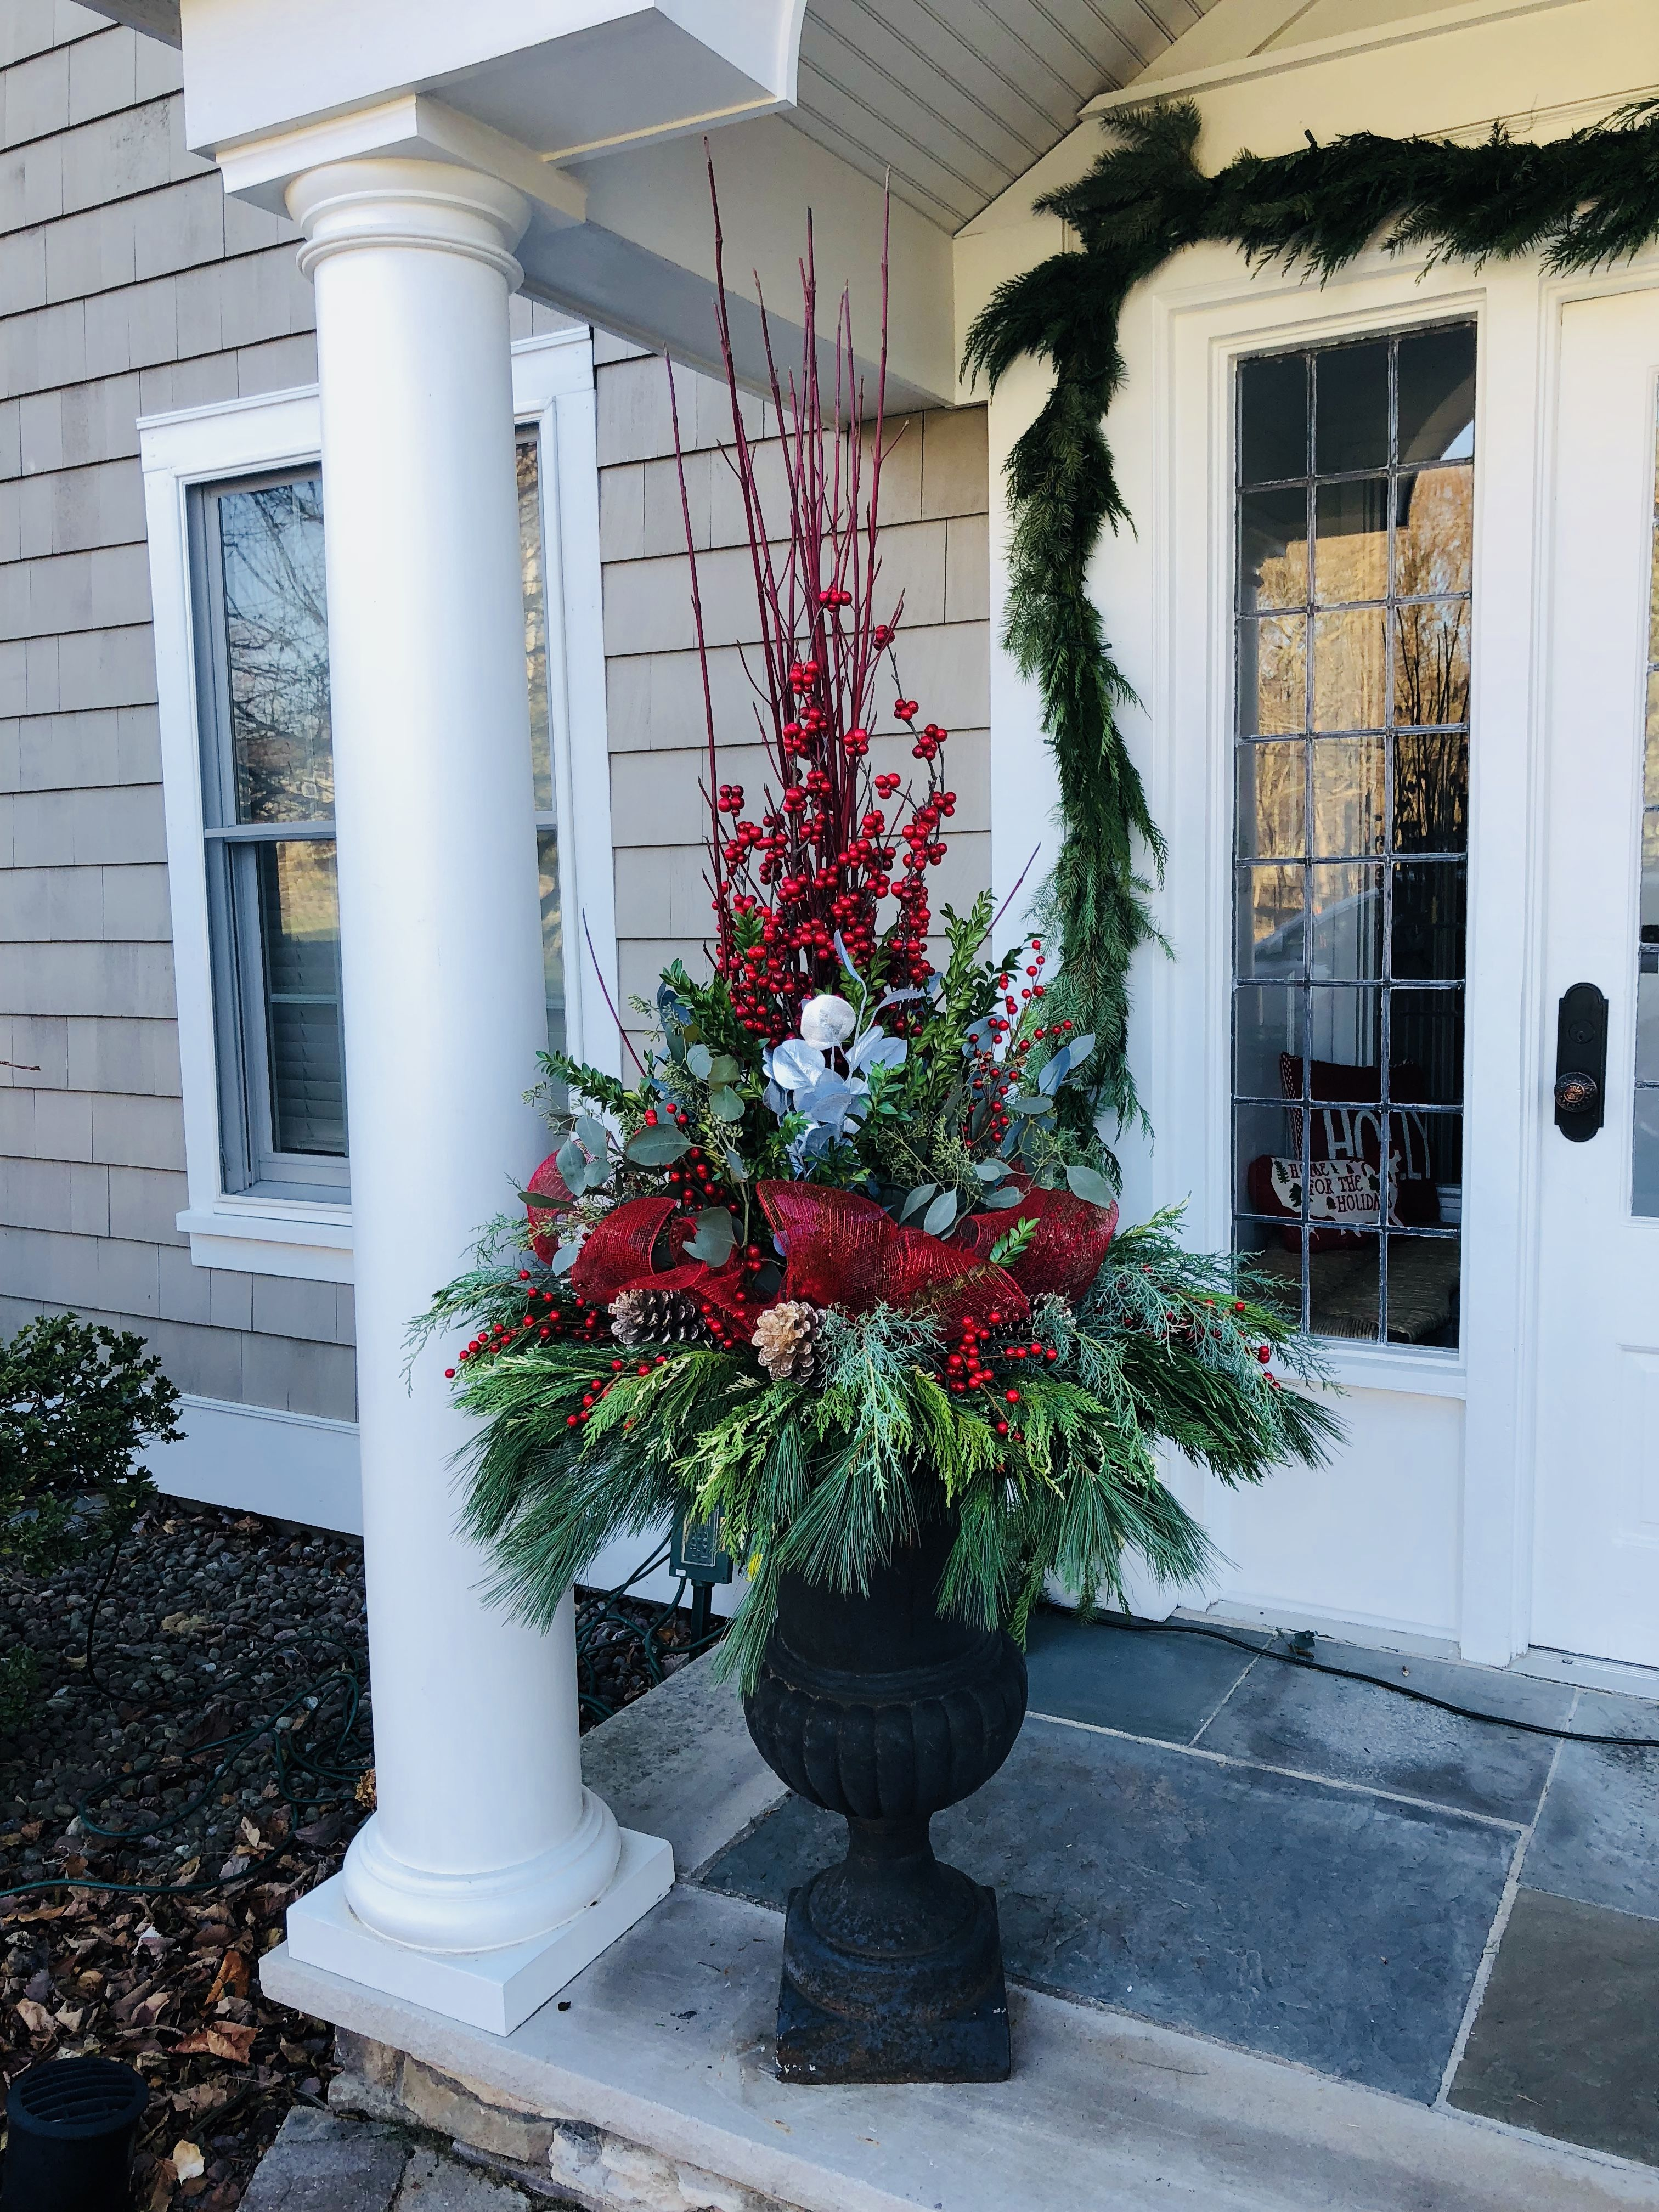 Holiday Urns Christmas urns, Holiday urn, Christmas planters